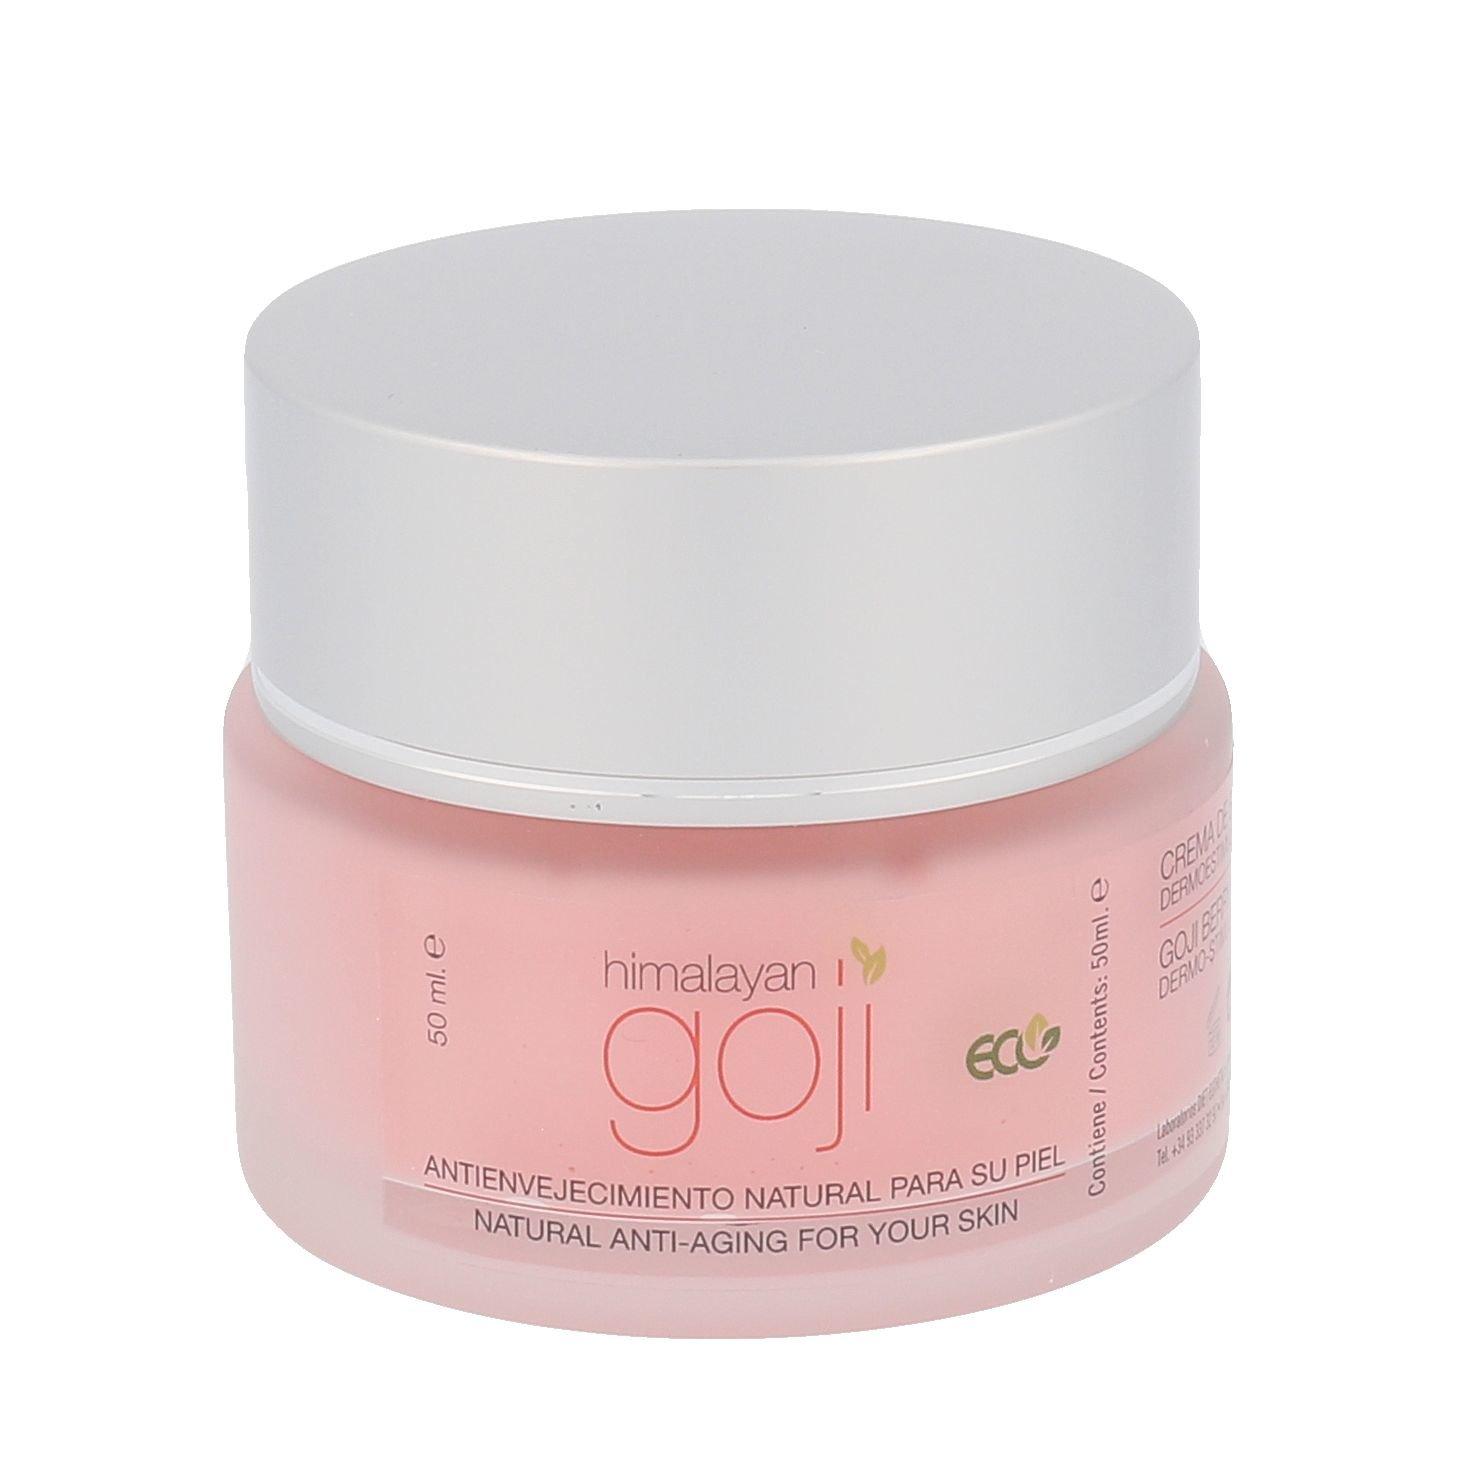 Diet Esthetic Himalayan Goji Cosmetic 50ml